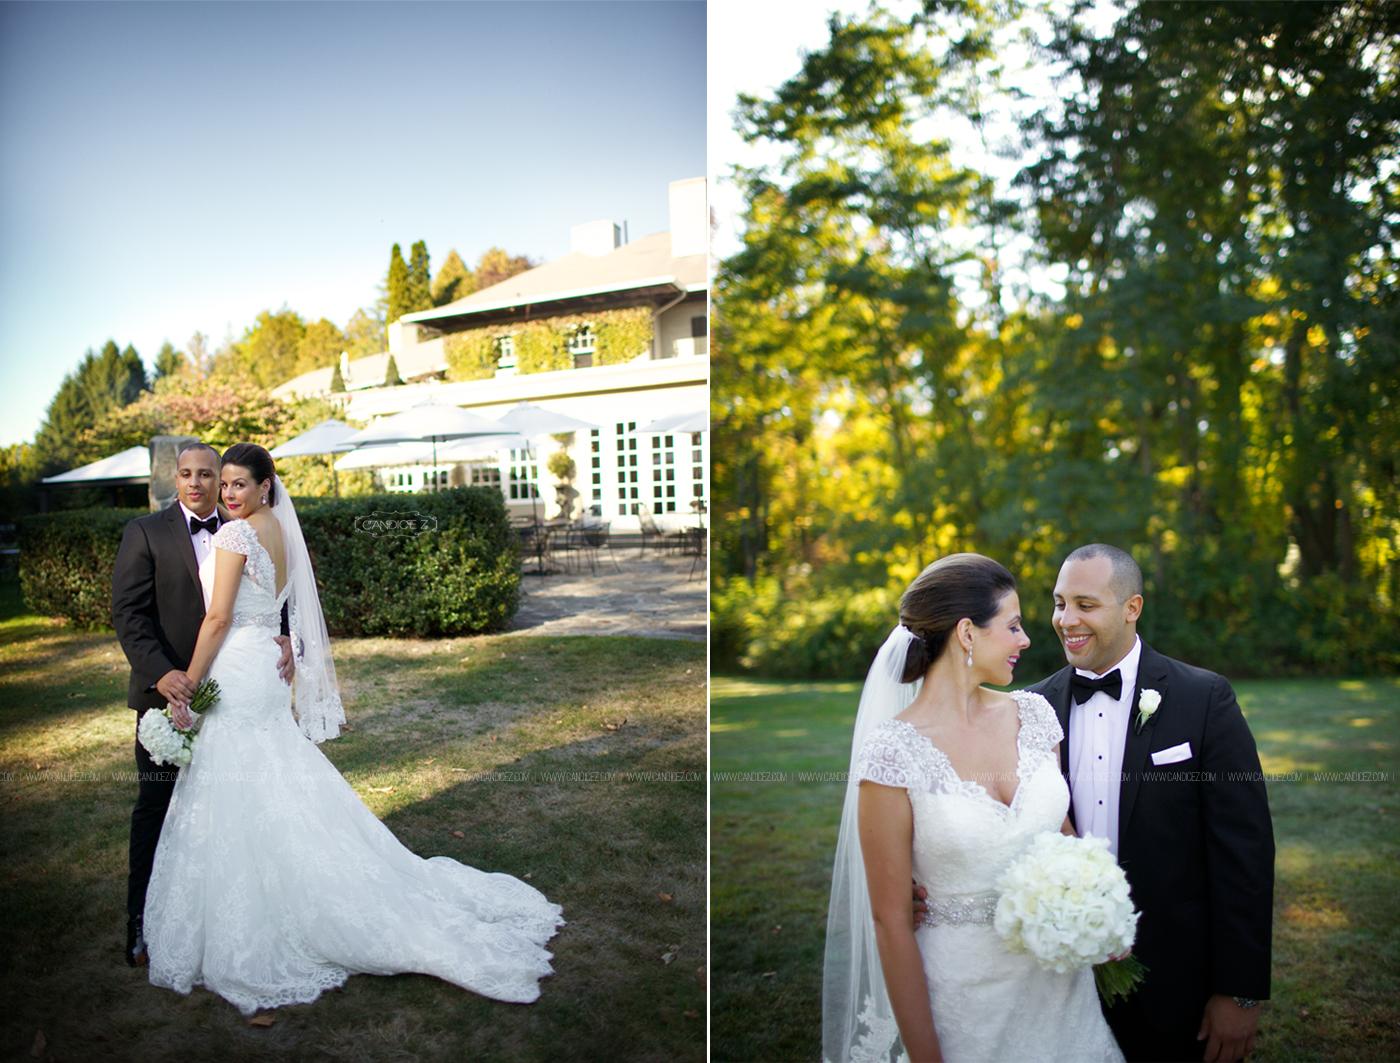 Lord_Thomson_Manor_Wedding_Back_Grounds.jpg